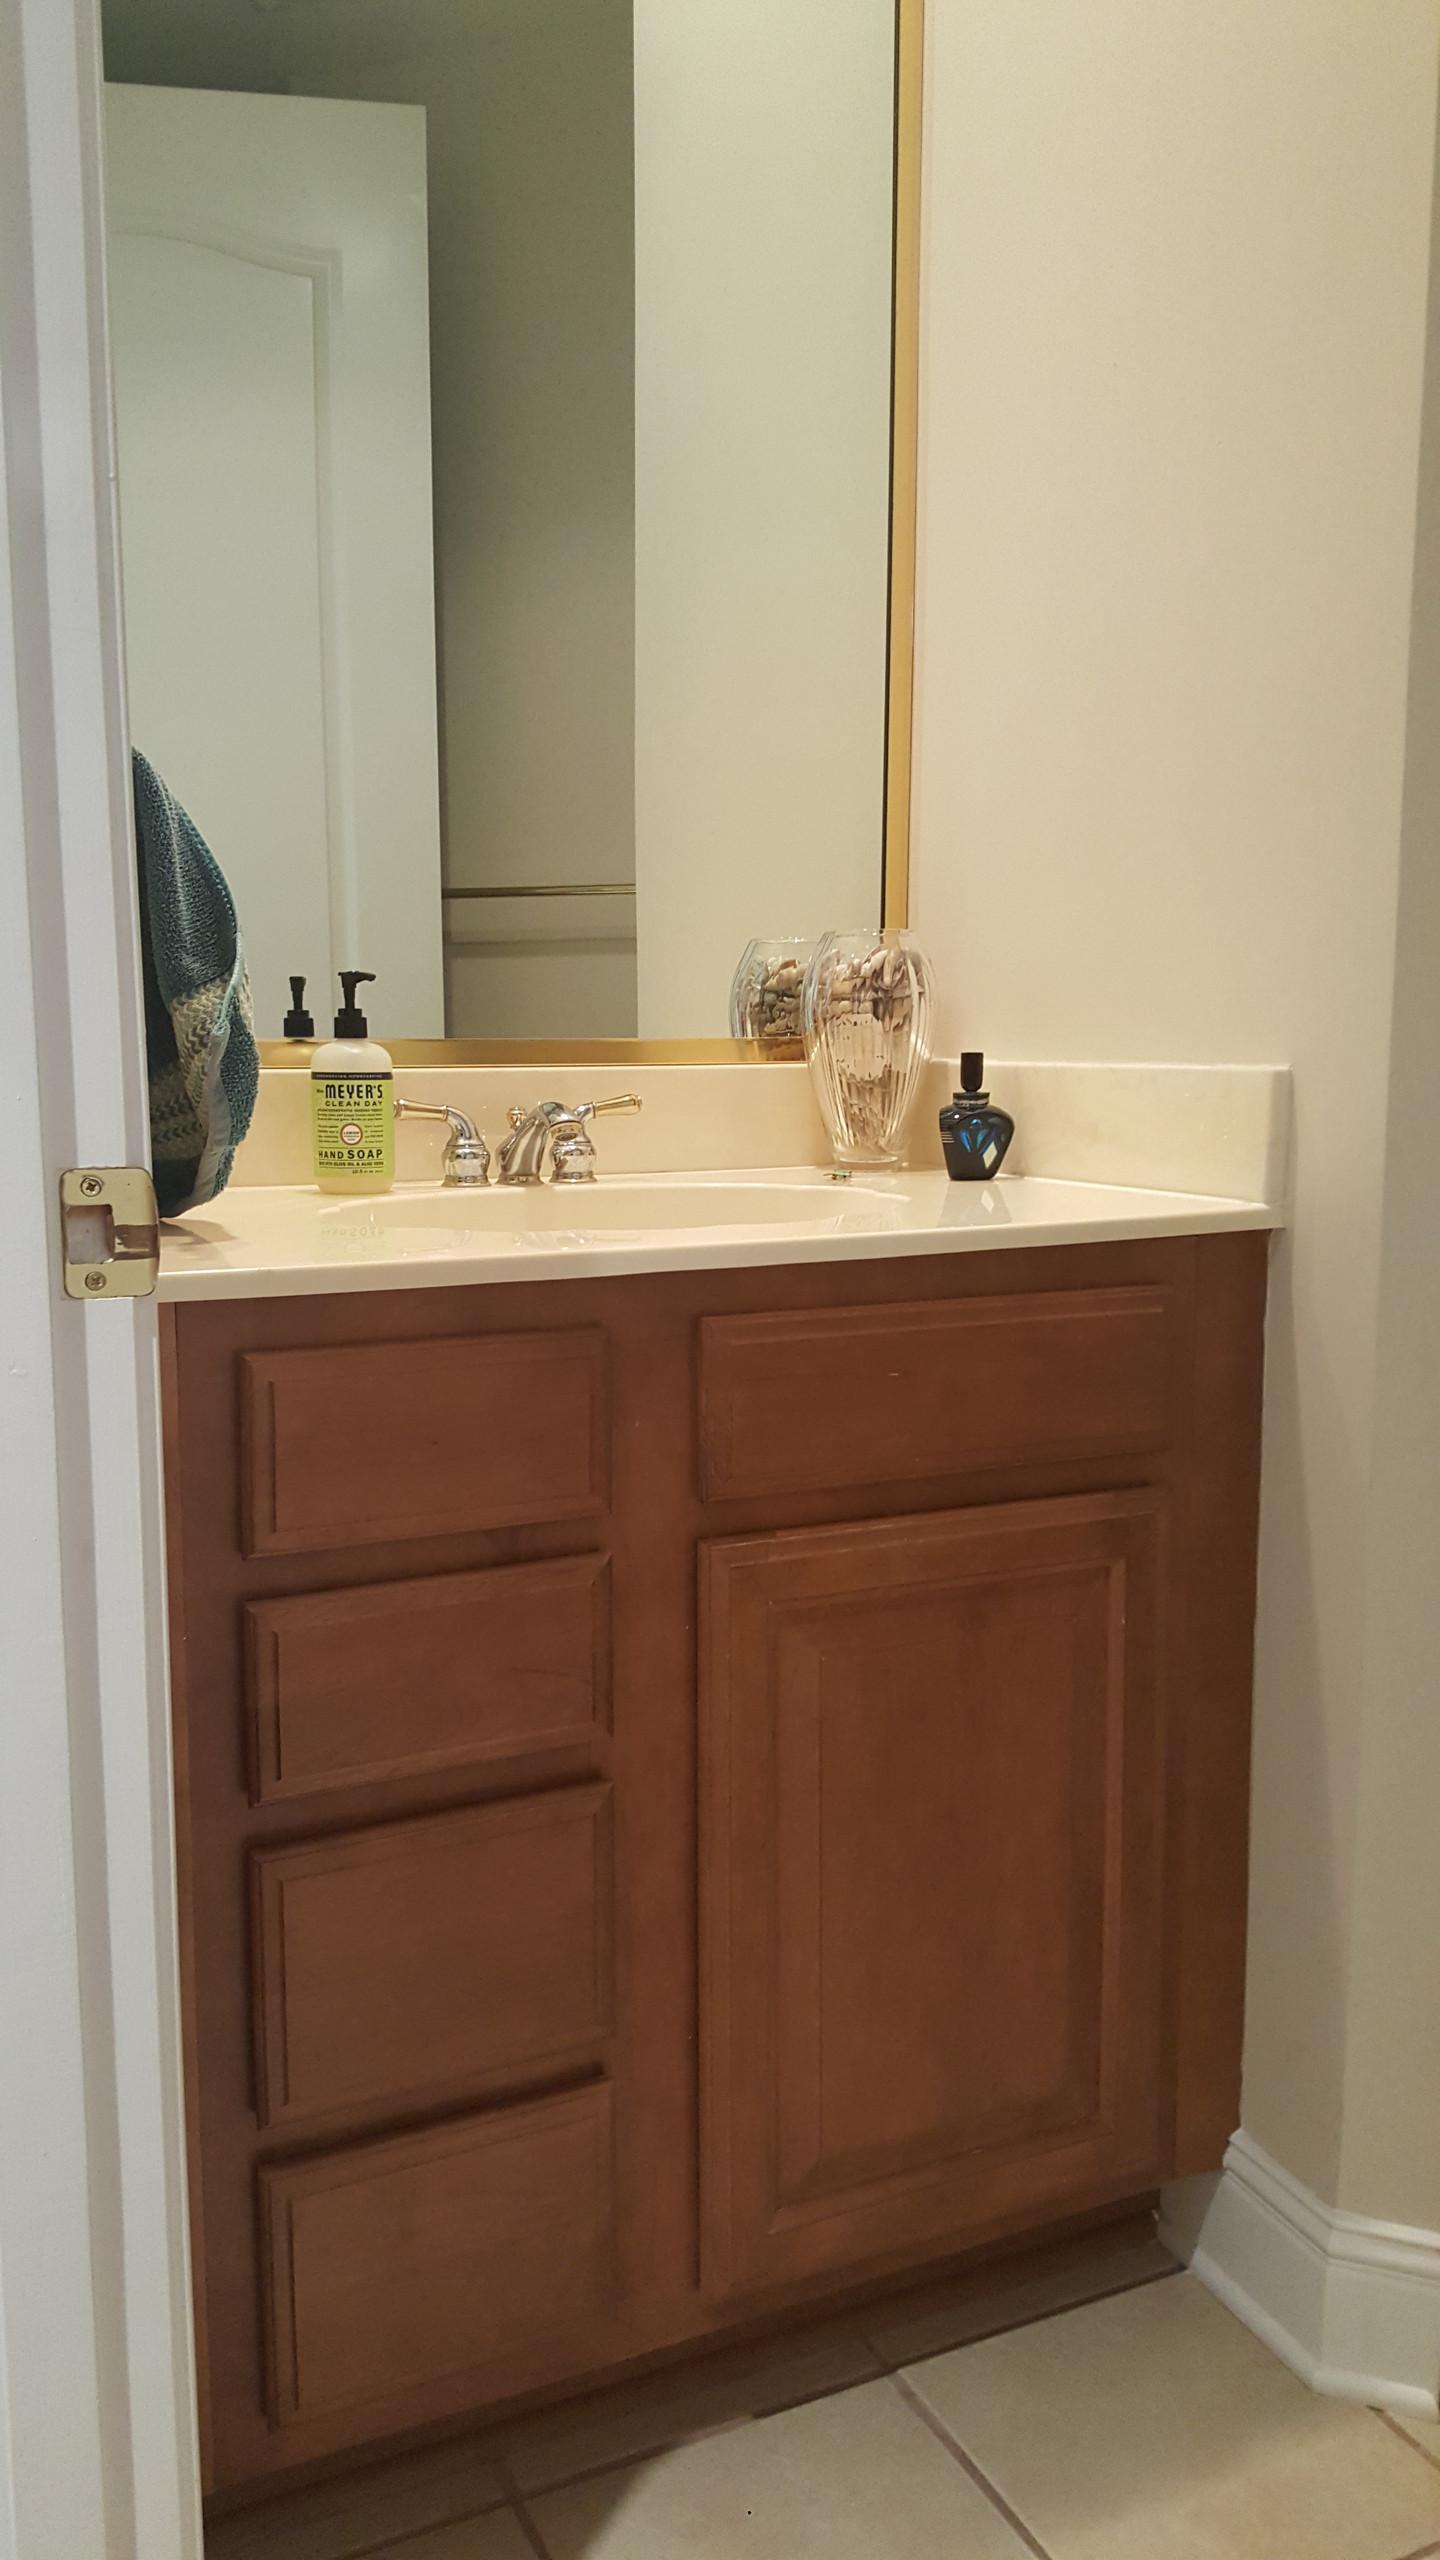 Original vanity and mirror